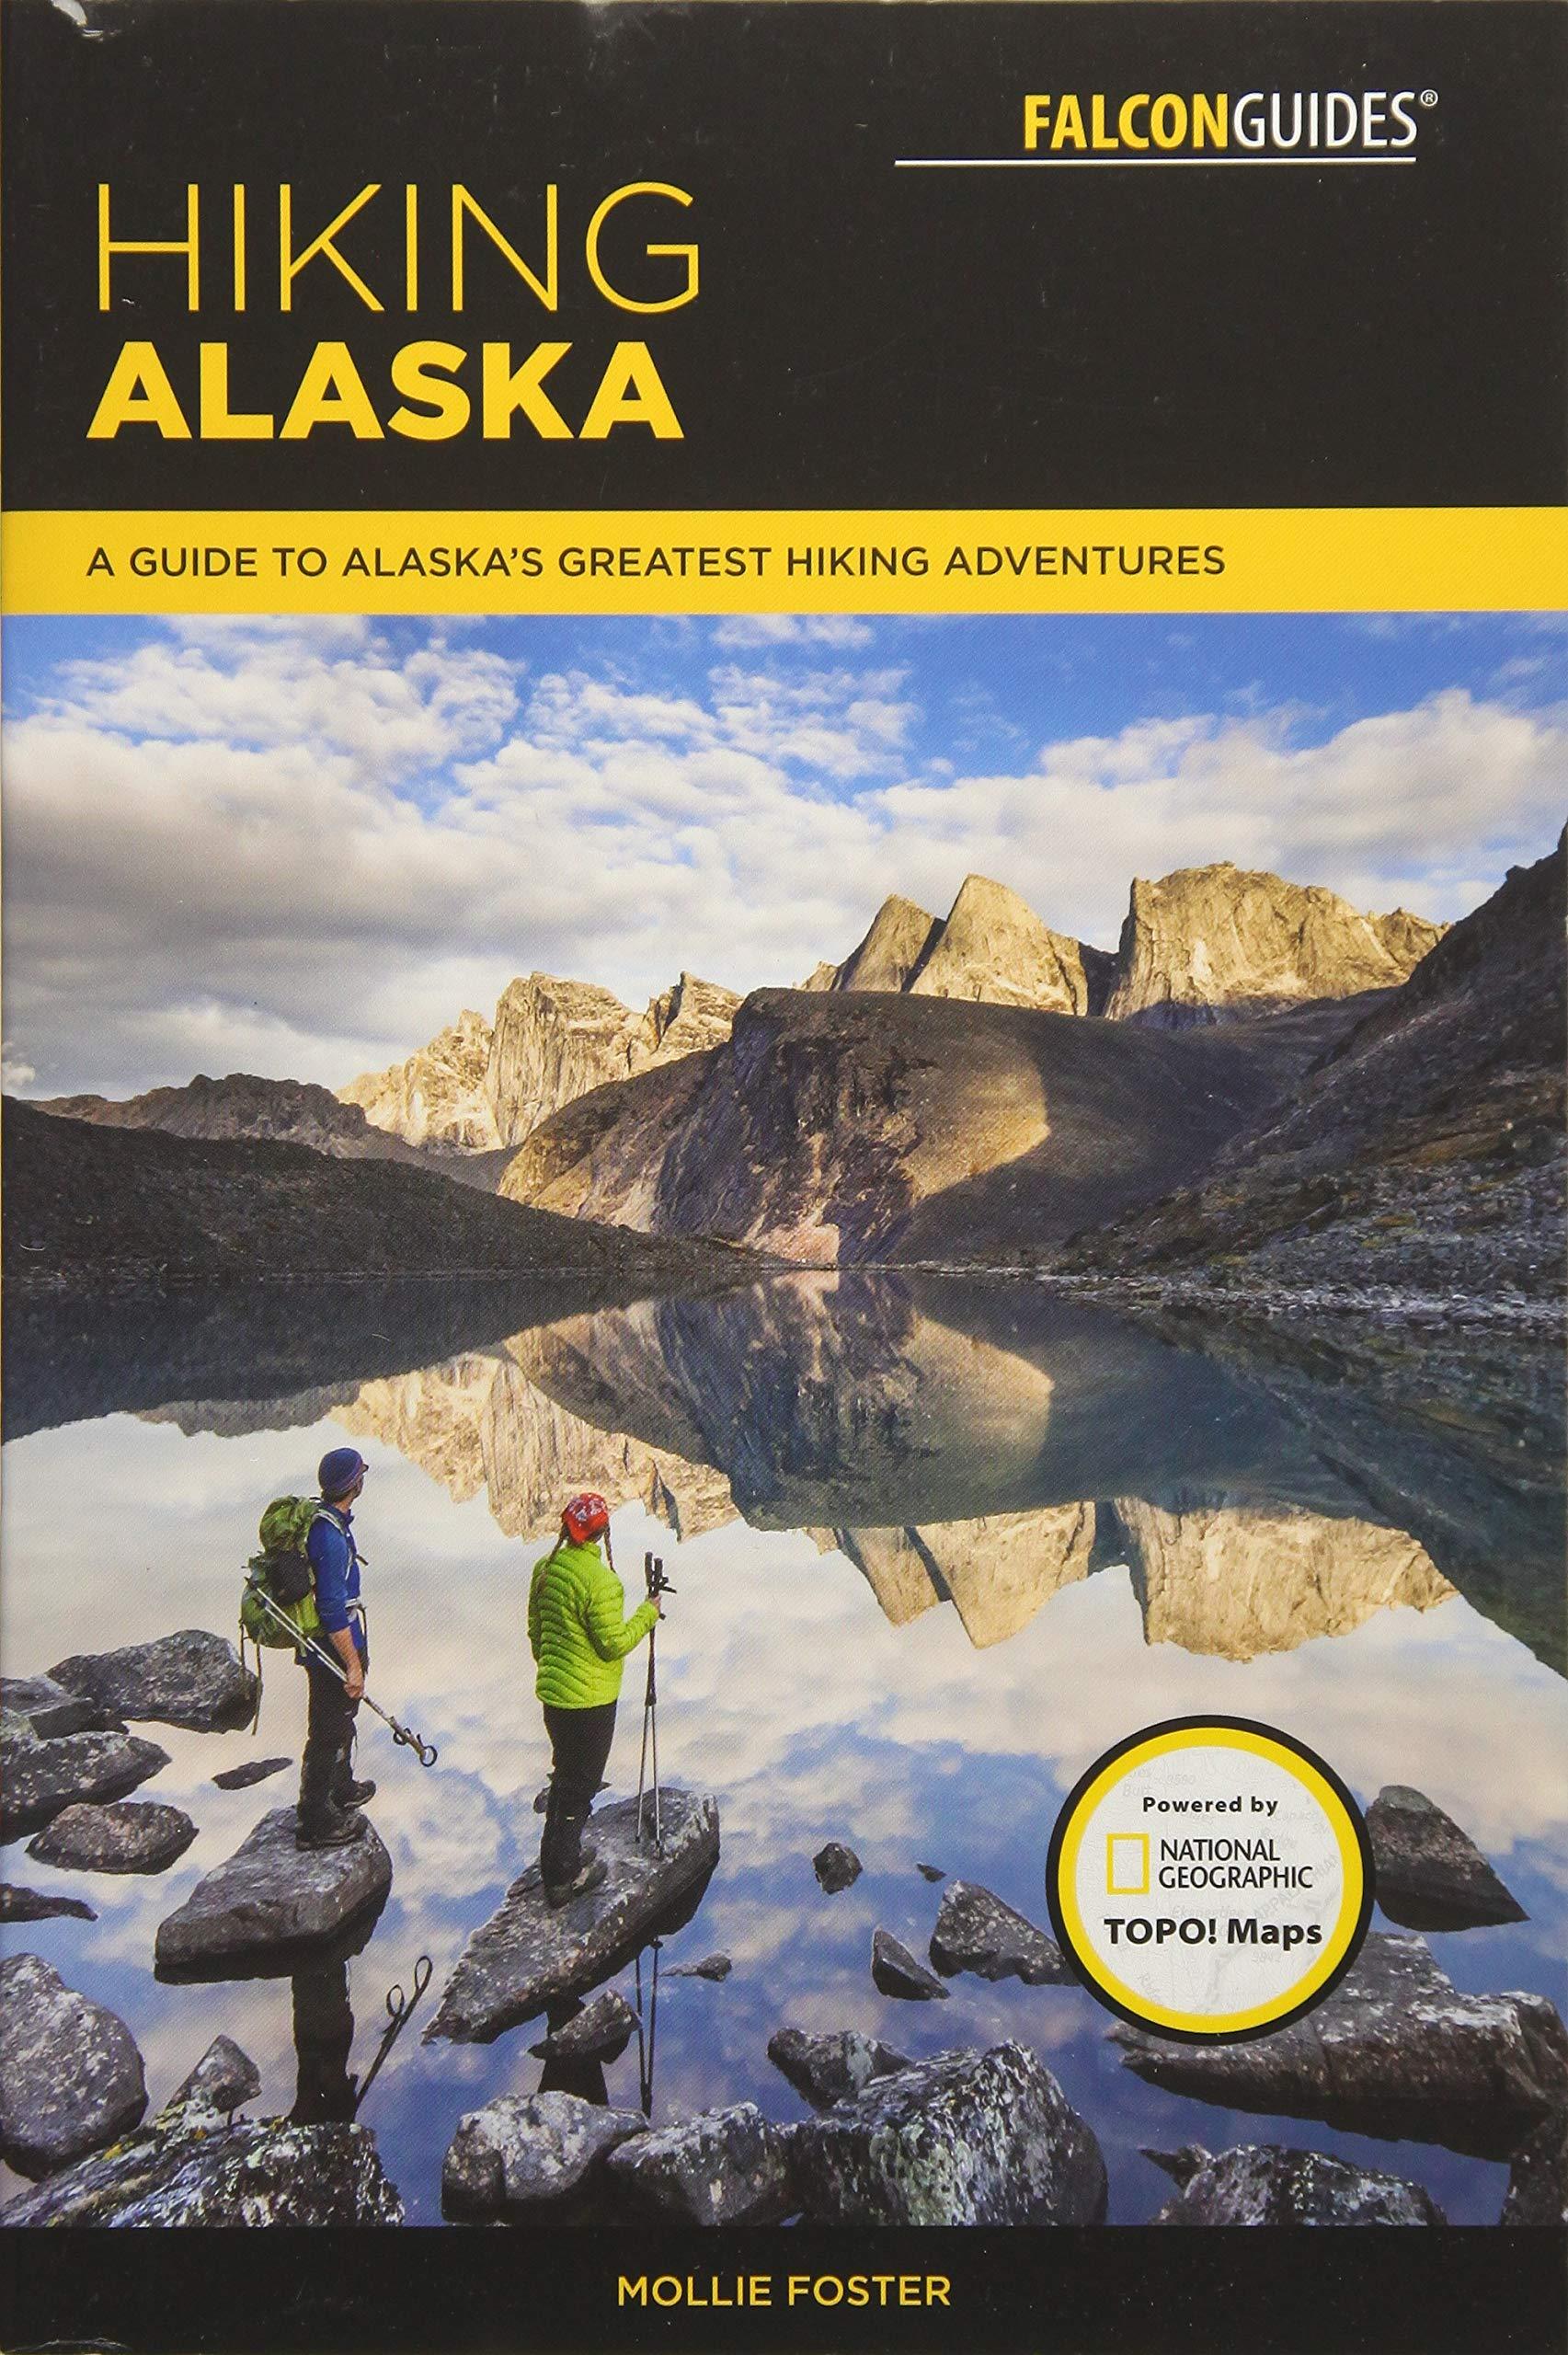 Hiking Alaska  A Guide To Alaska's Greatest Hiking Adventures  Falcon Guides Regional Hiking